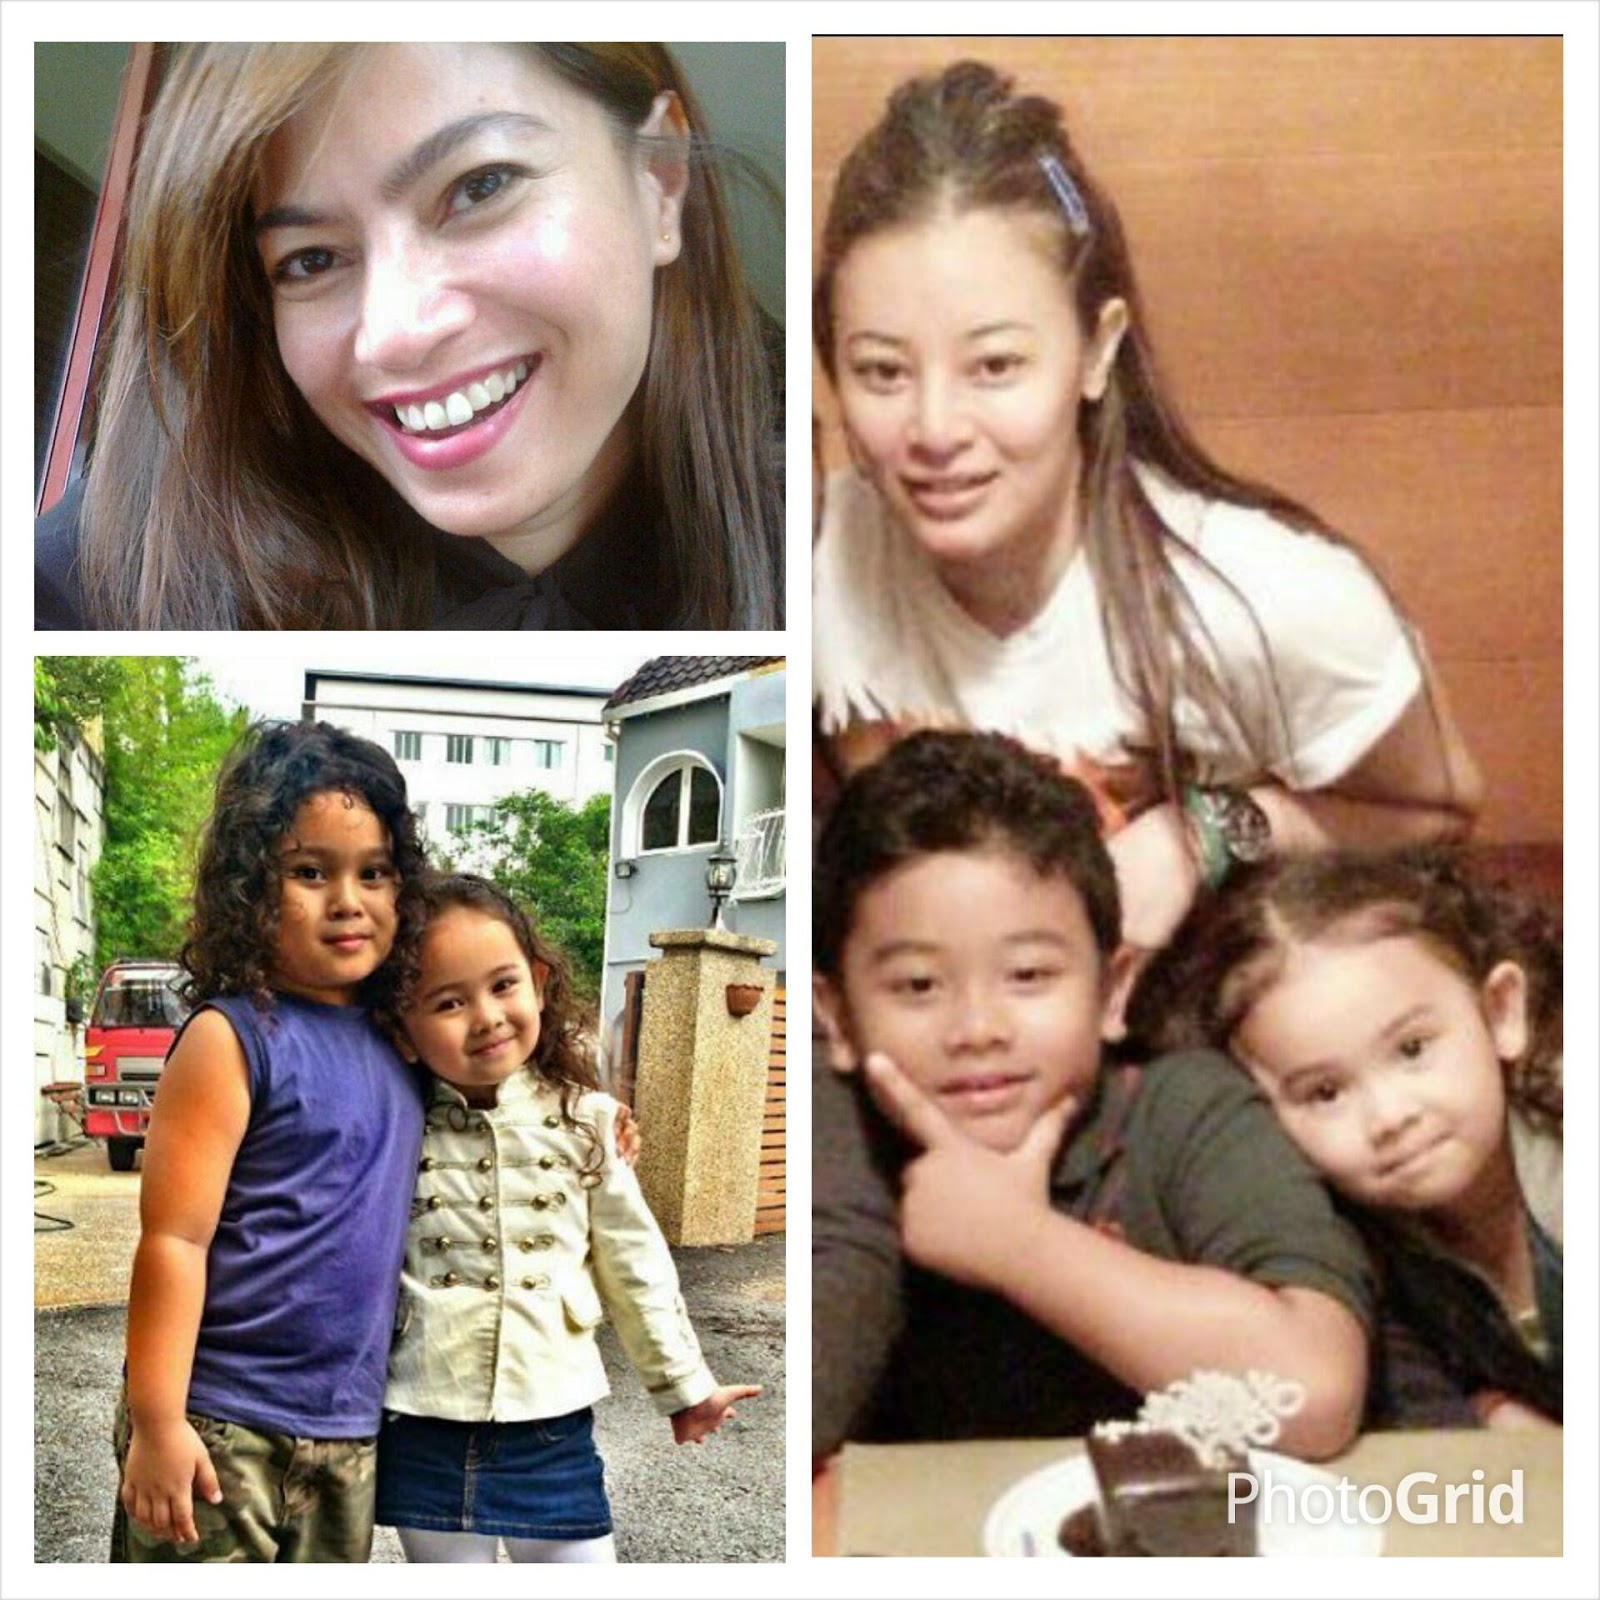 Anak-Anak Saudara Saya Bukan Anak Luar Nikah! , info, terkini, hiburan, sensasi, kontroversi, gossip, awie, rozana misbun,